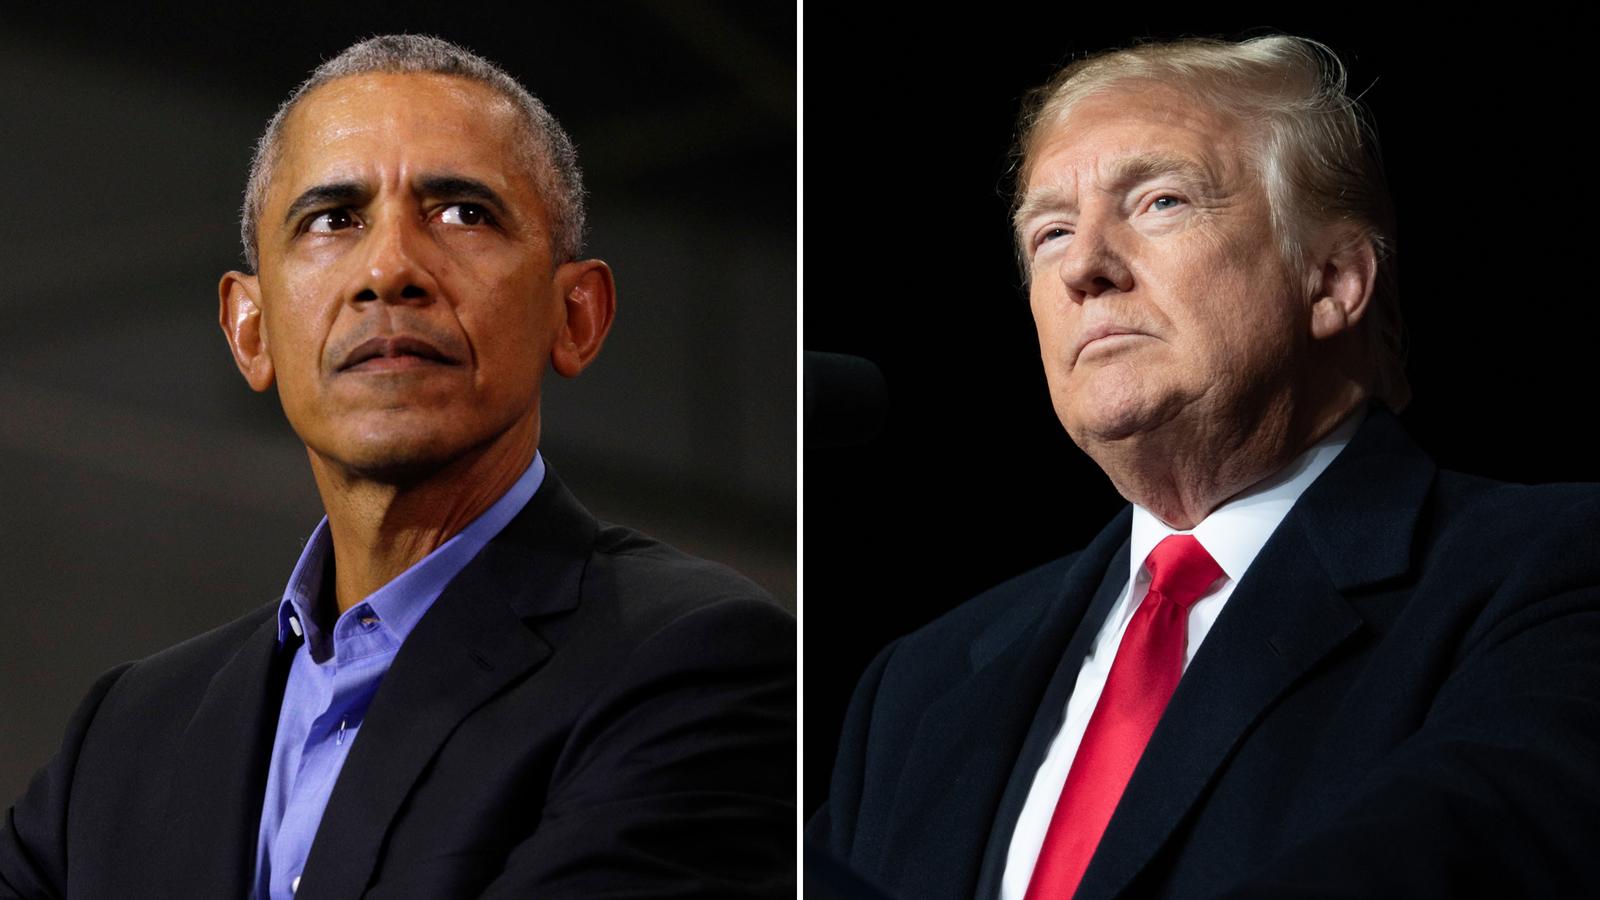 Presidents Barak Obama and Donald Trump